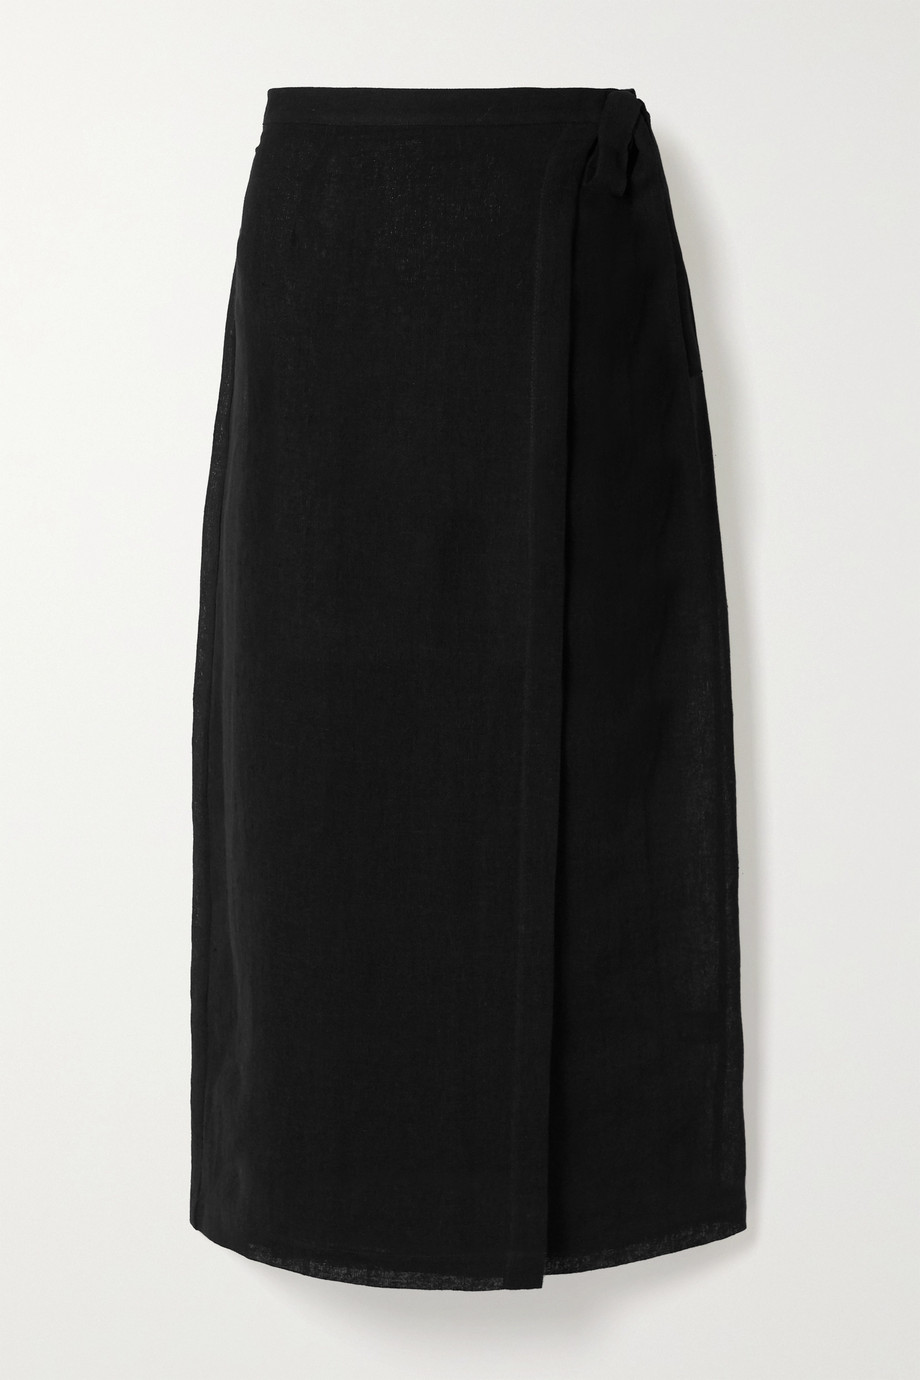 Lisa Marie Fernandez 亚麻混纺薄纱围裹式中长半身裙